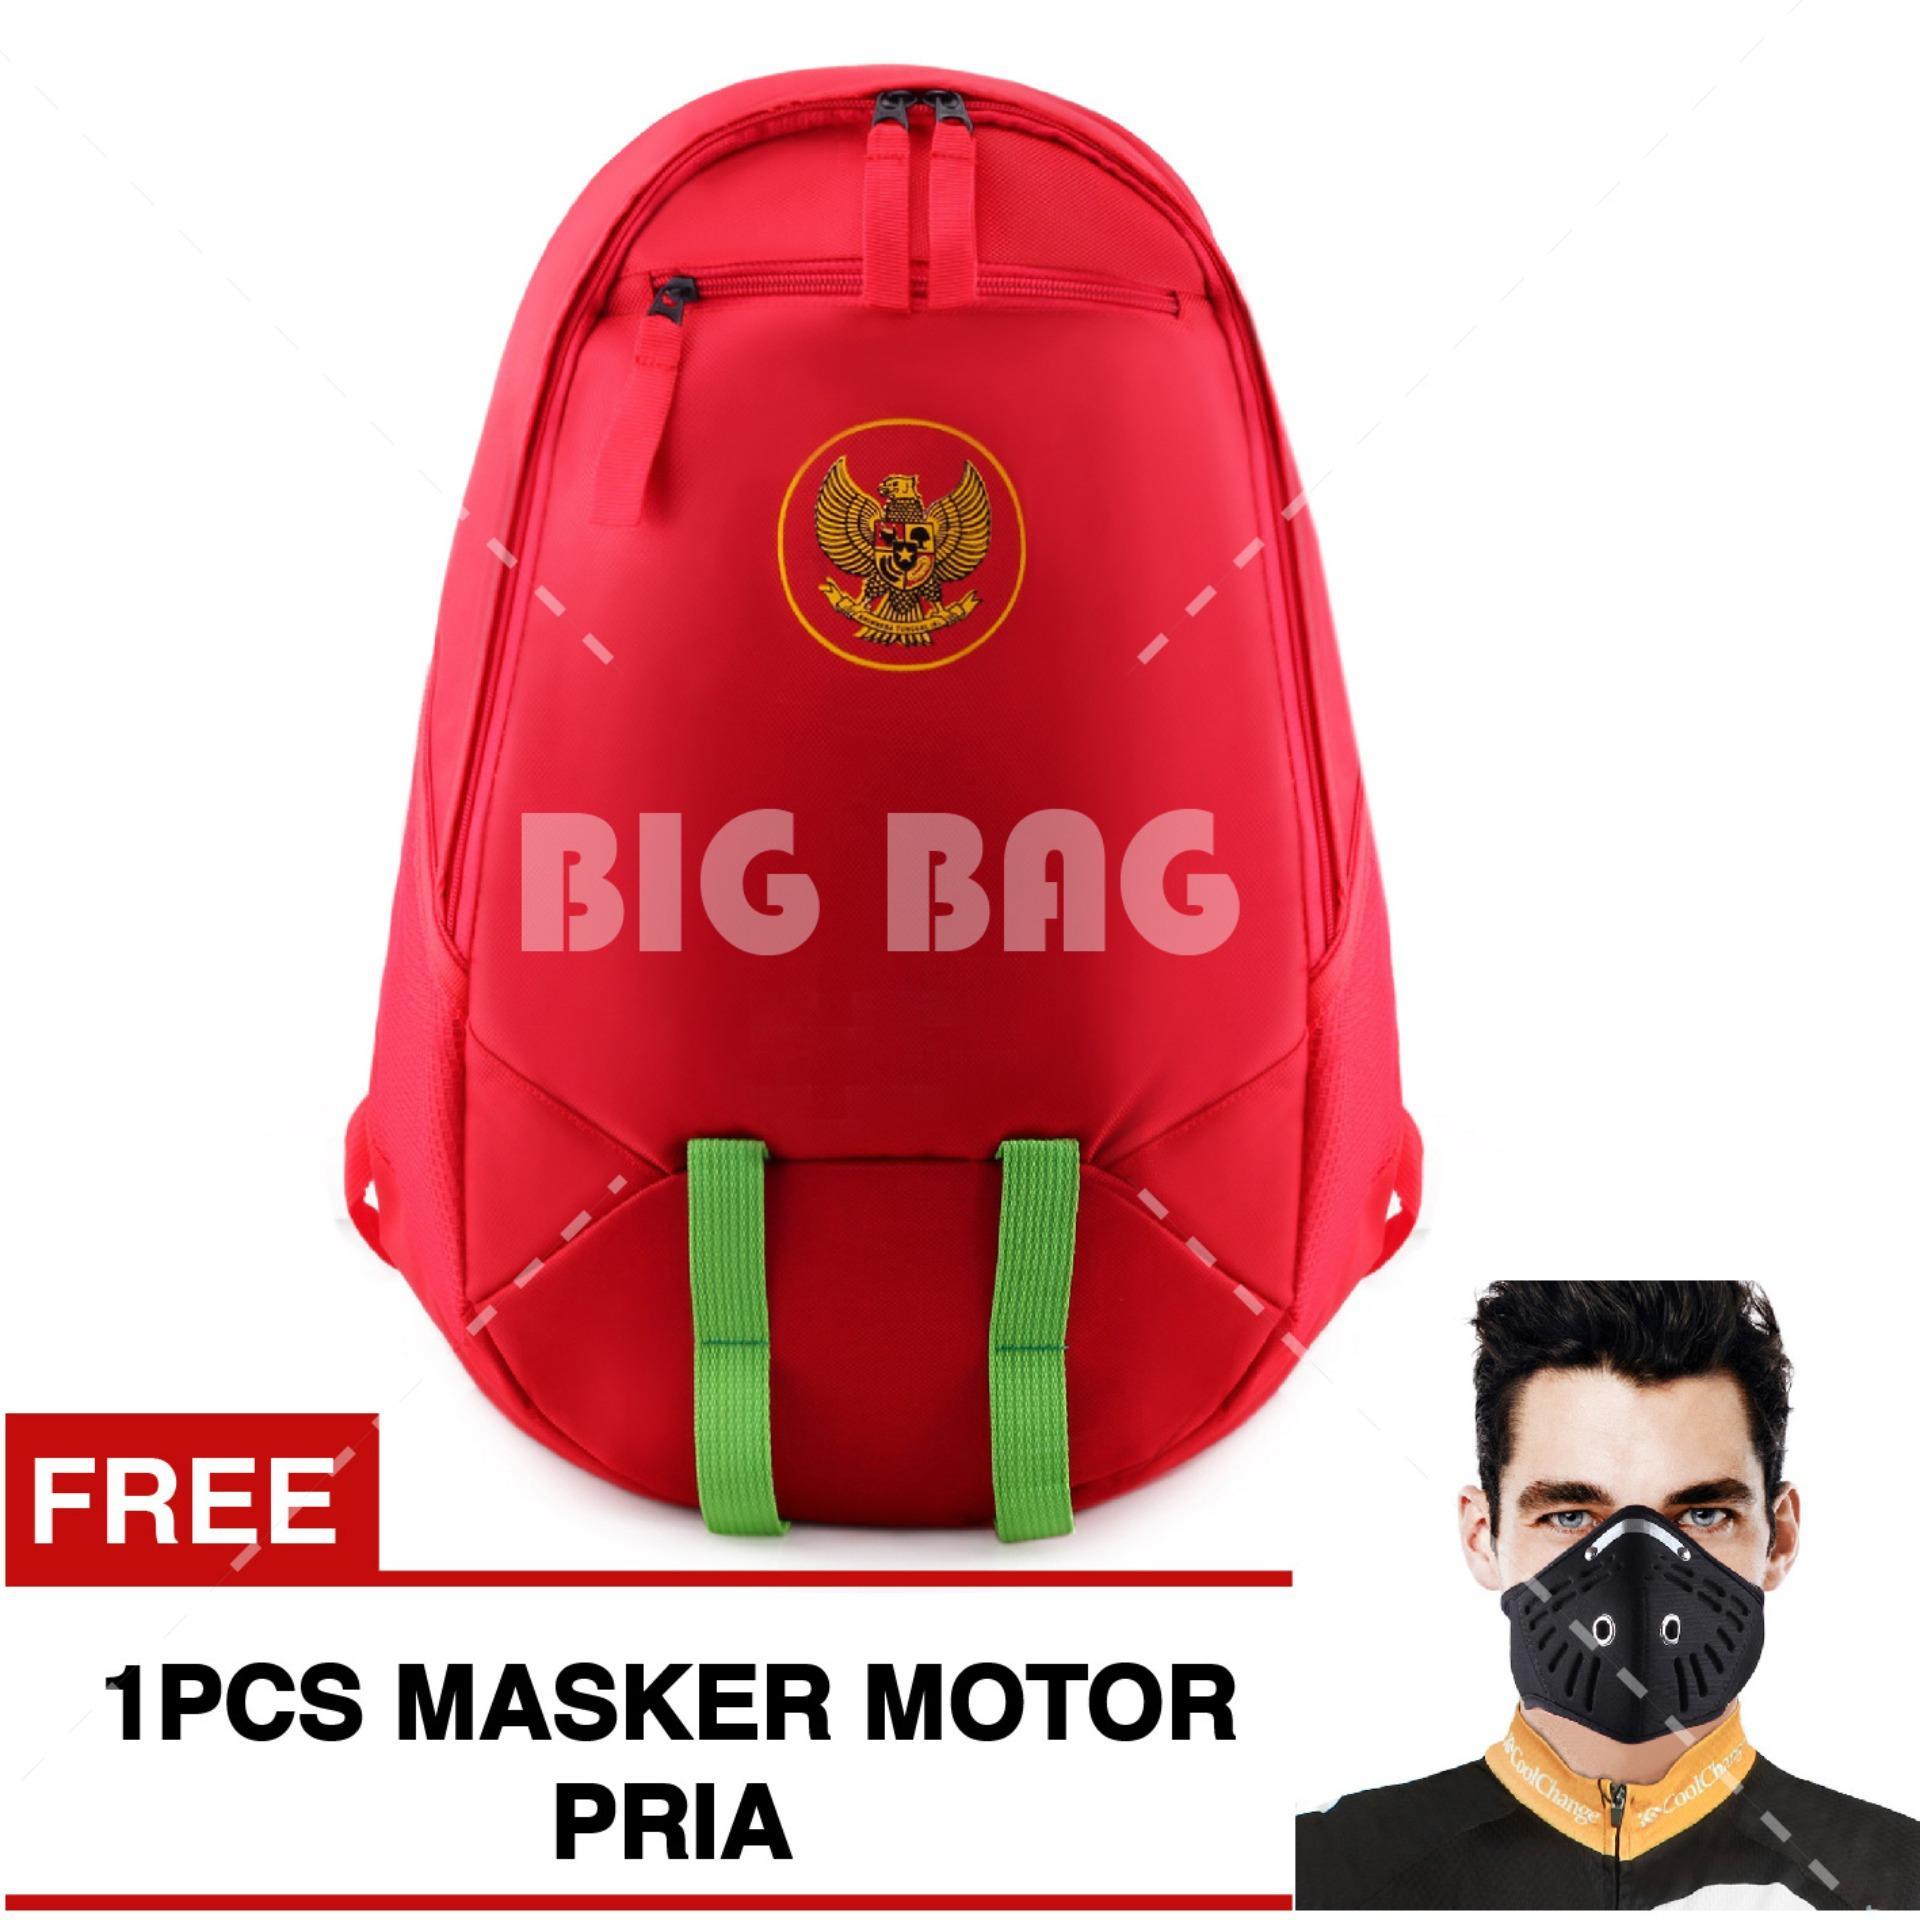 Spesifikasi Tas Ransel Bola Pria Garuda Indonesia Laptop Backpack Men Soccer Editions Red Free Masker Motor Pria Yg Baik